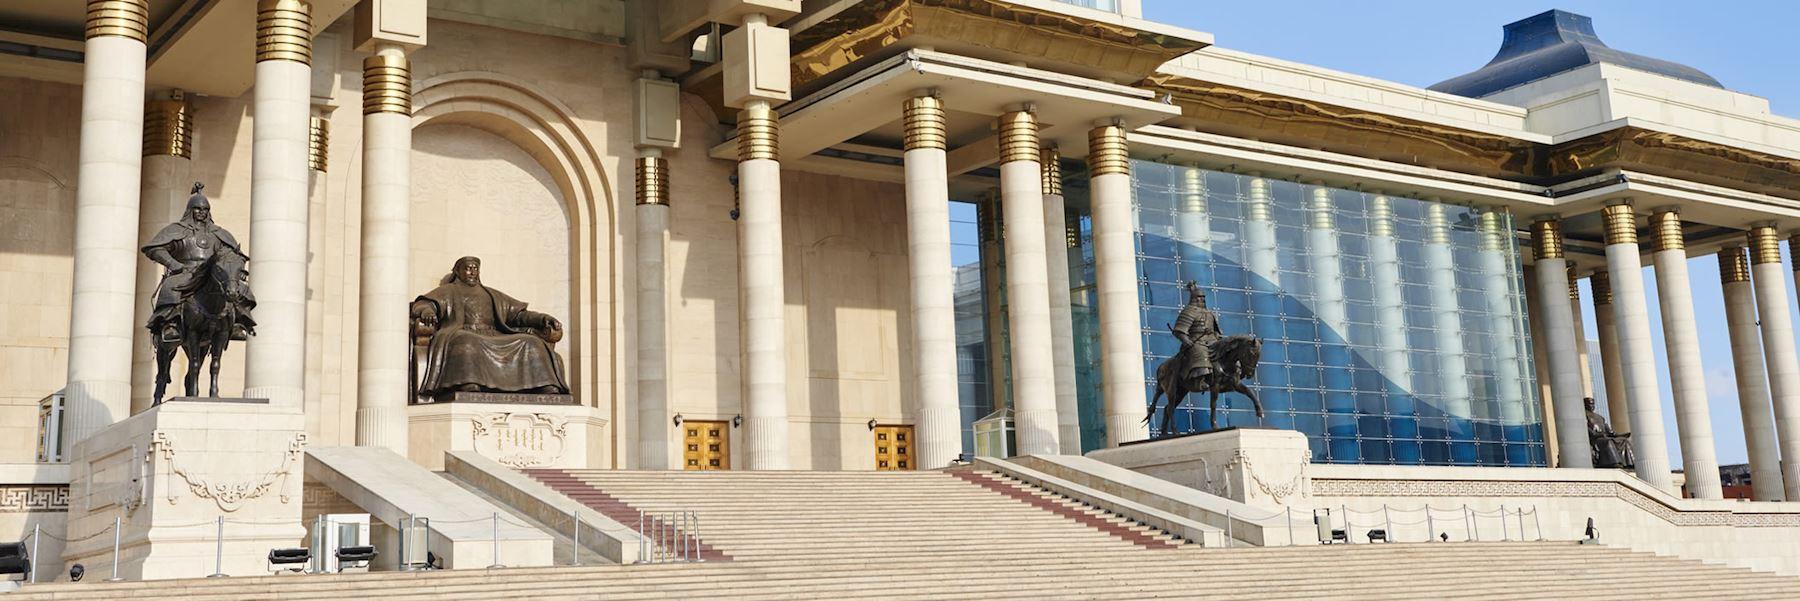 Visit Ulaan Baatar, Mongolia